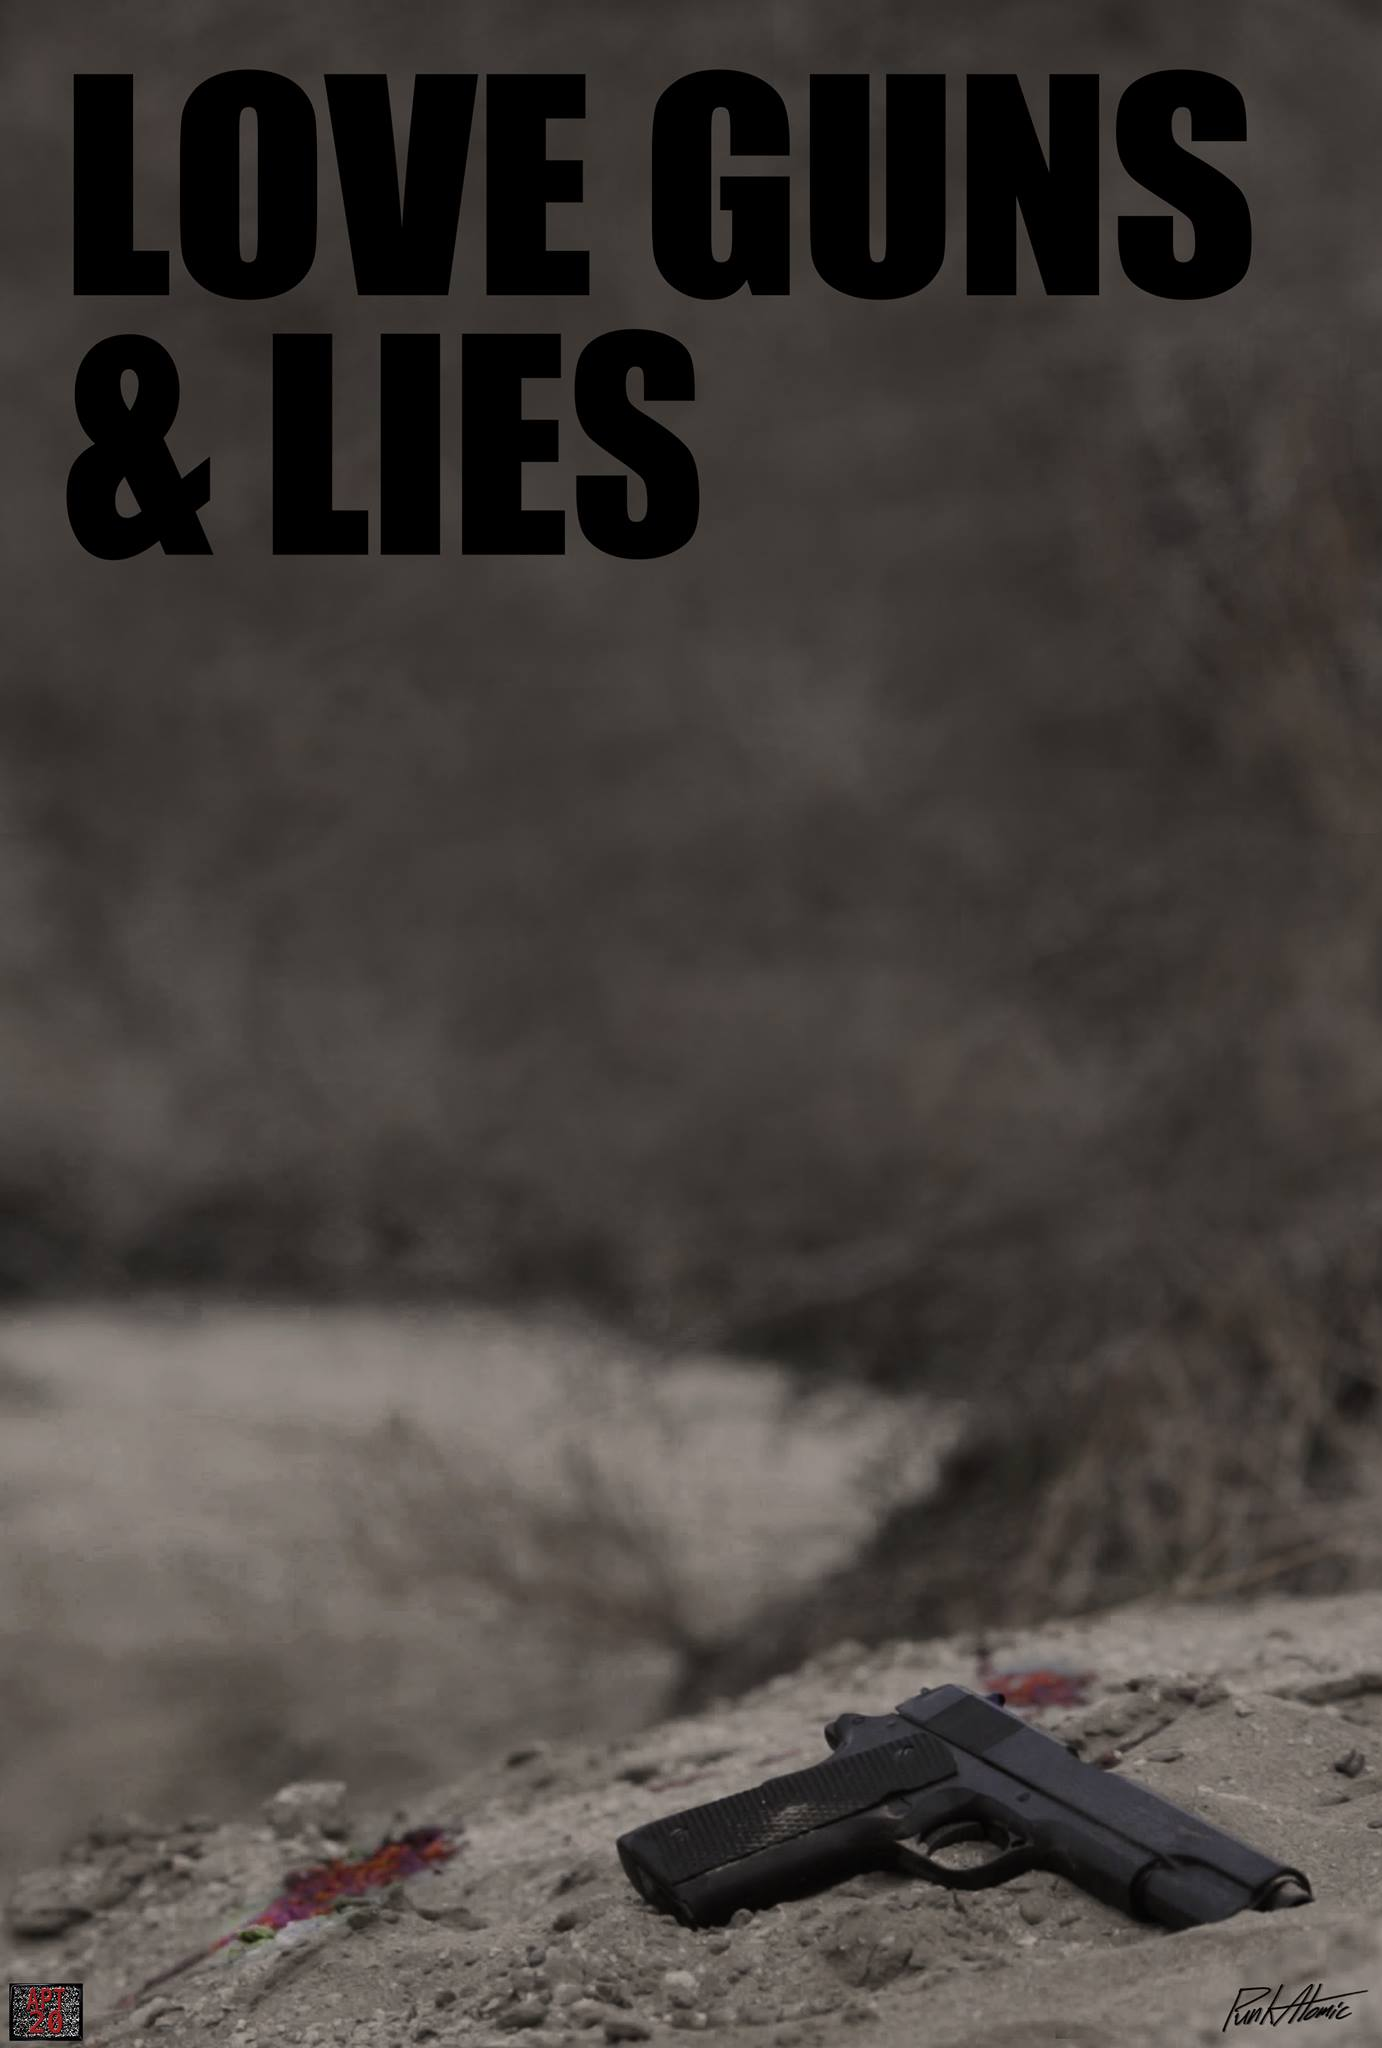 Love Guns Lies - Short Film Production